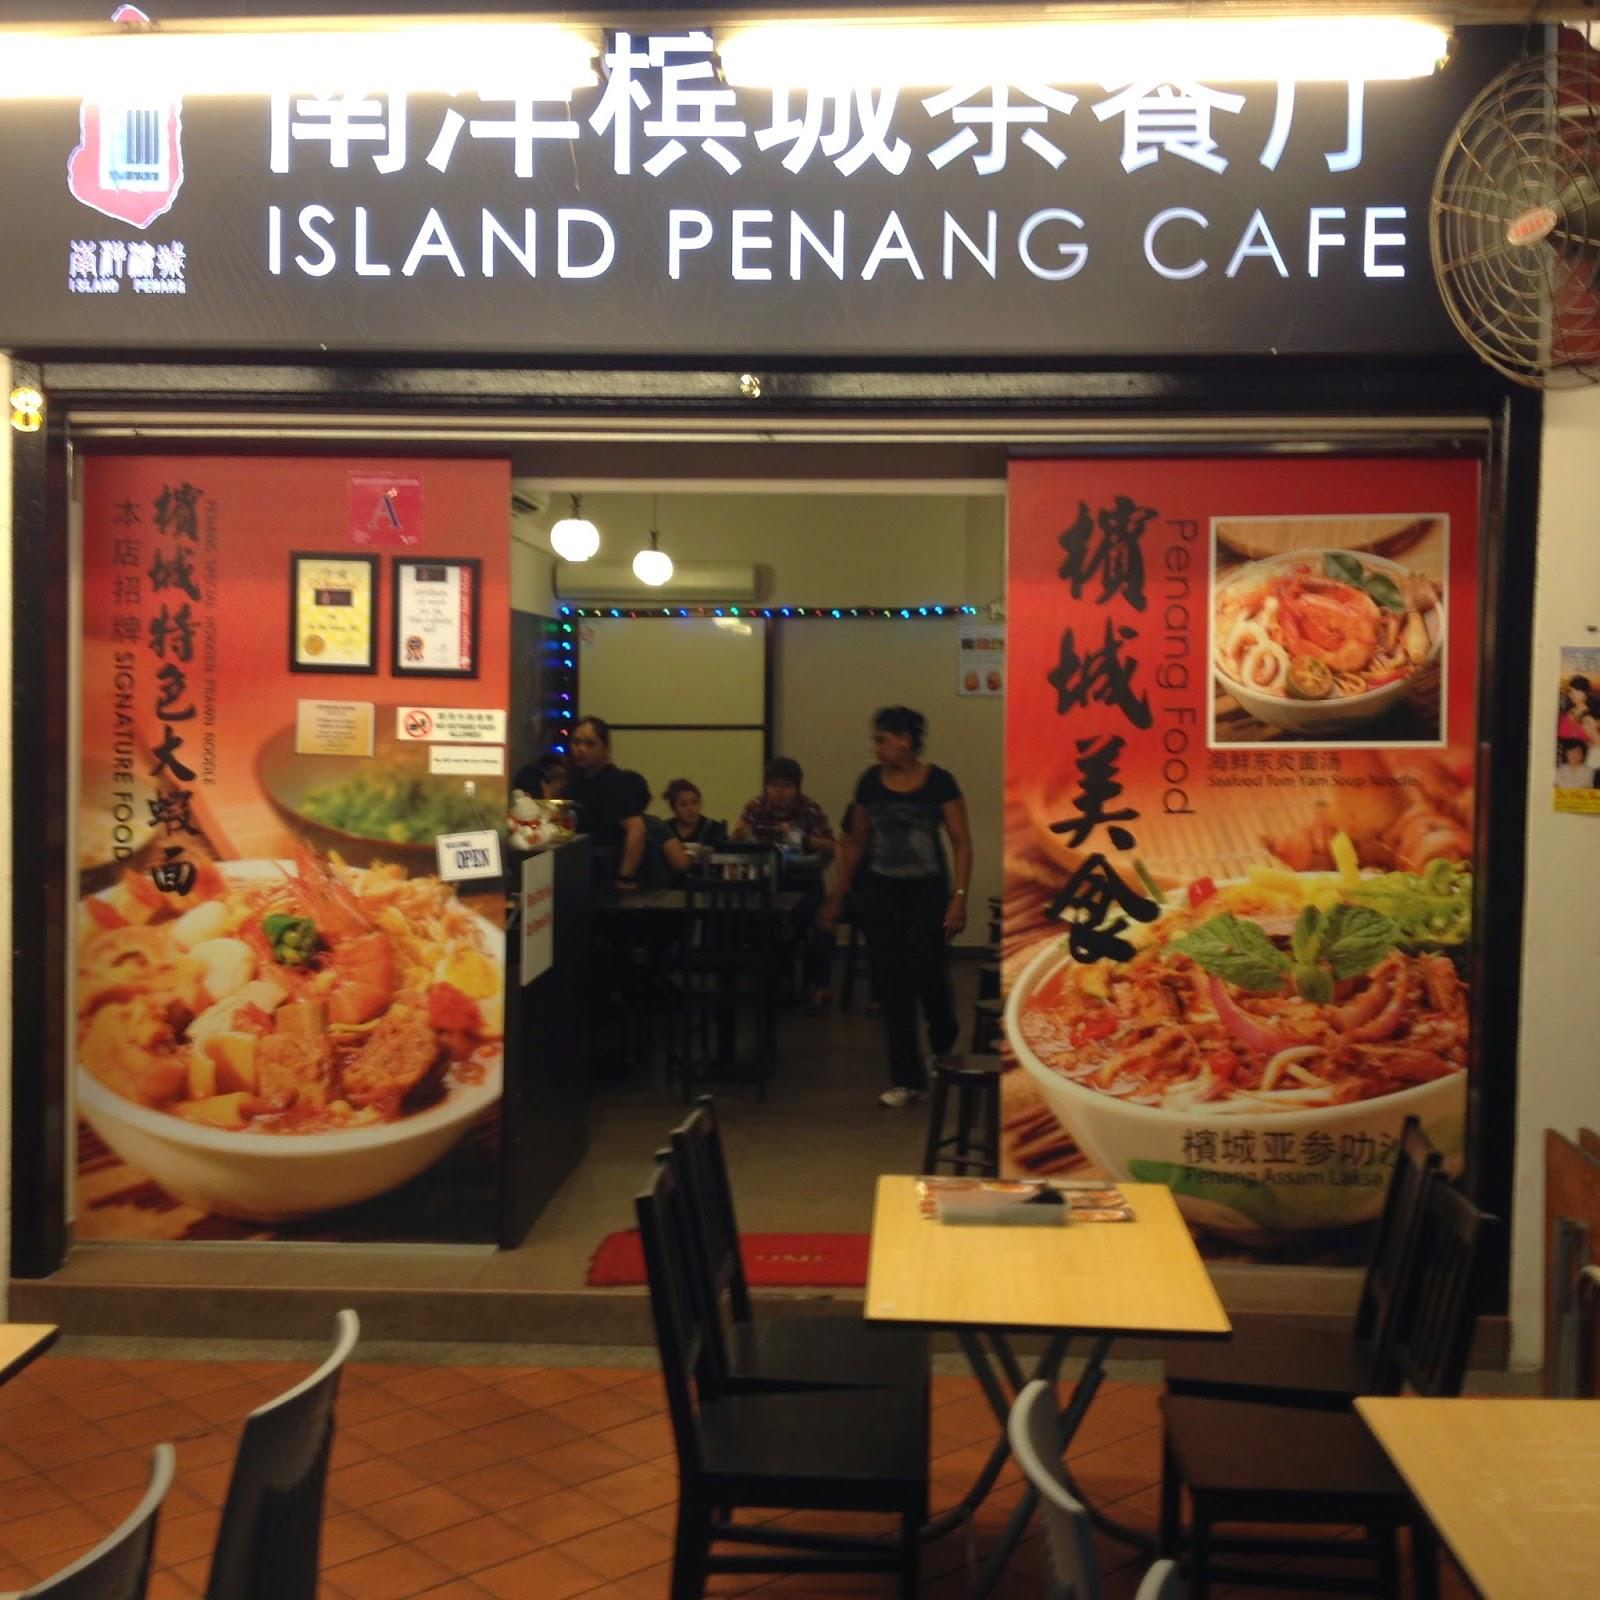 Island Penang Cafe Chinatown